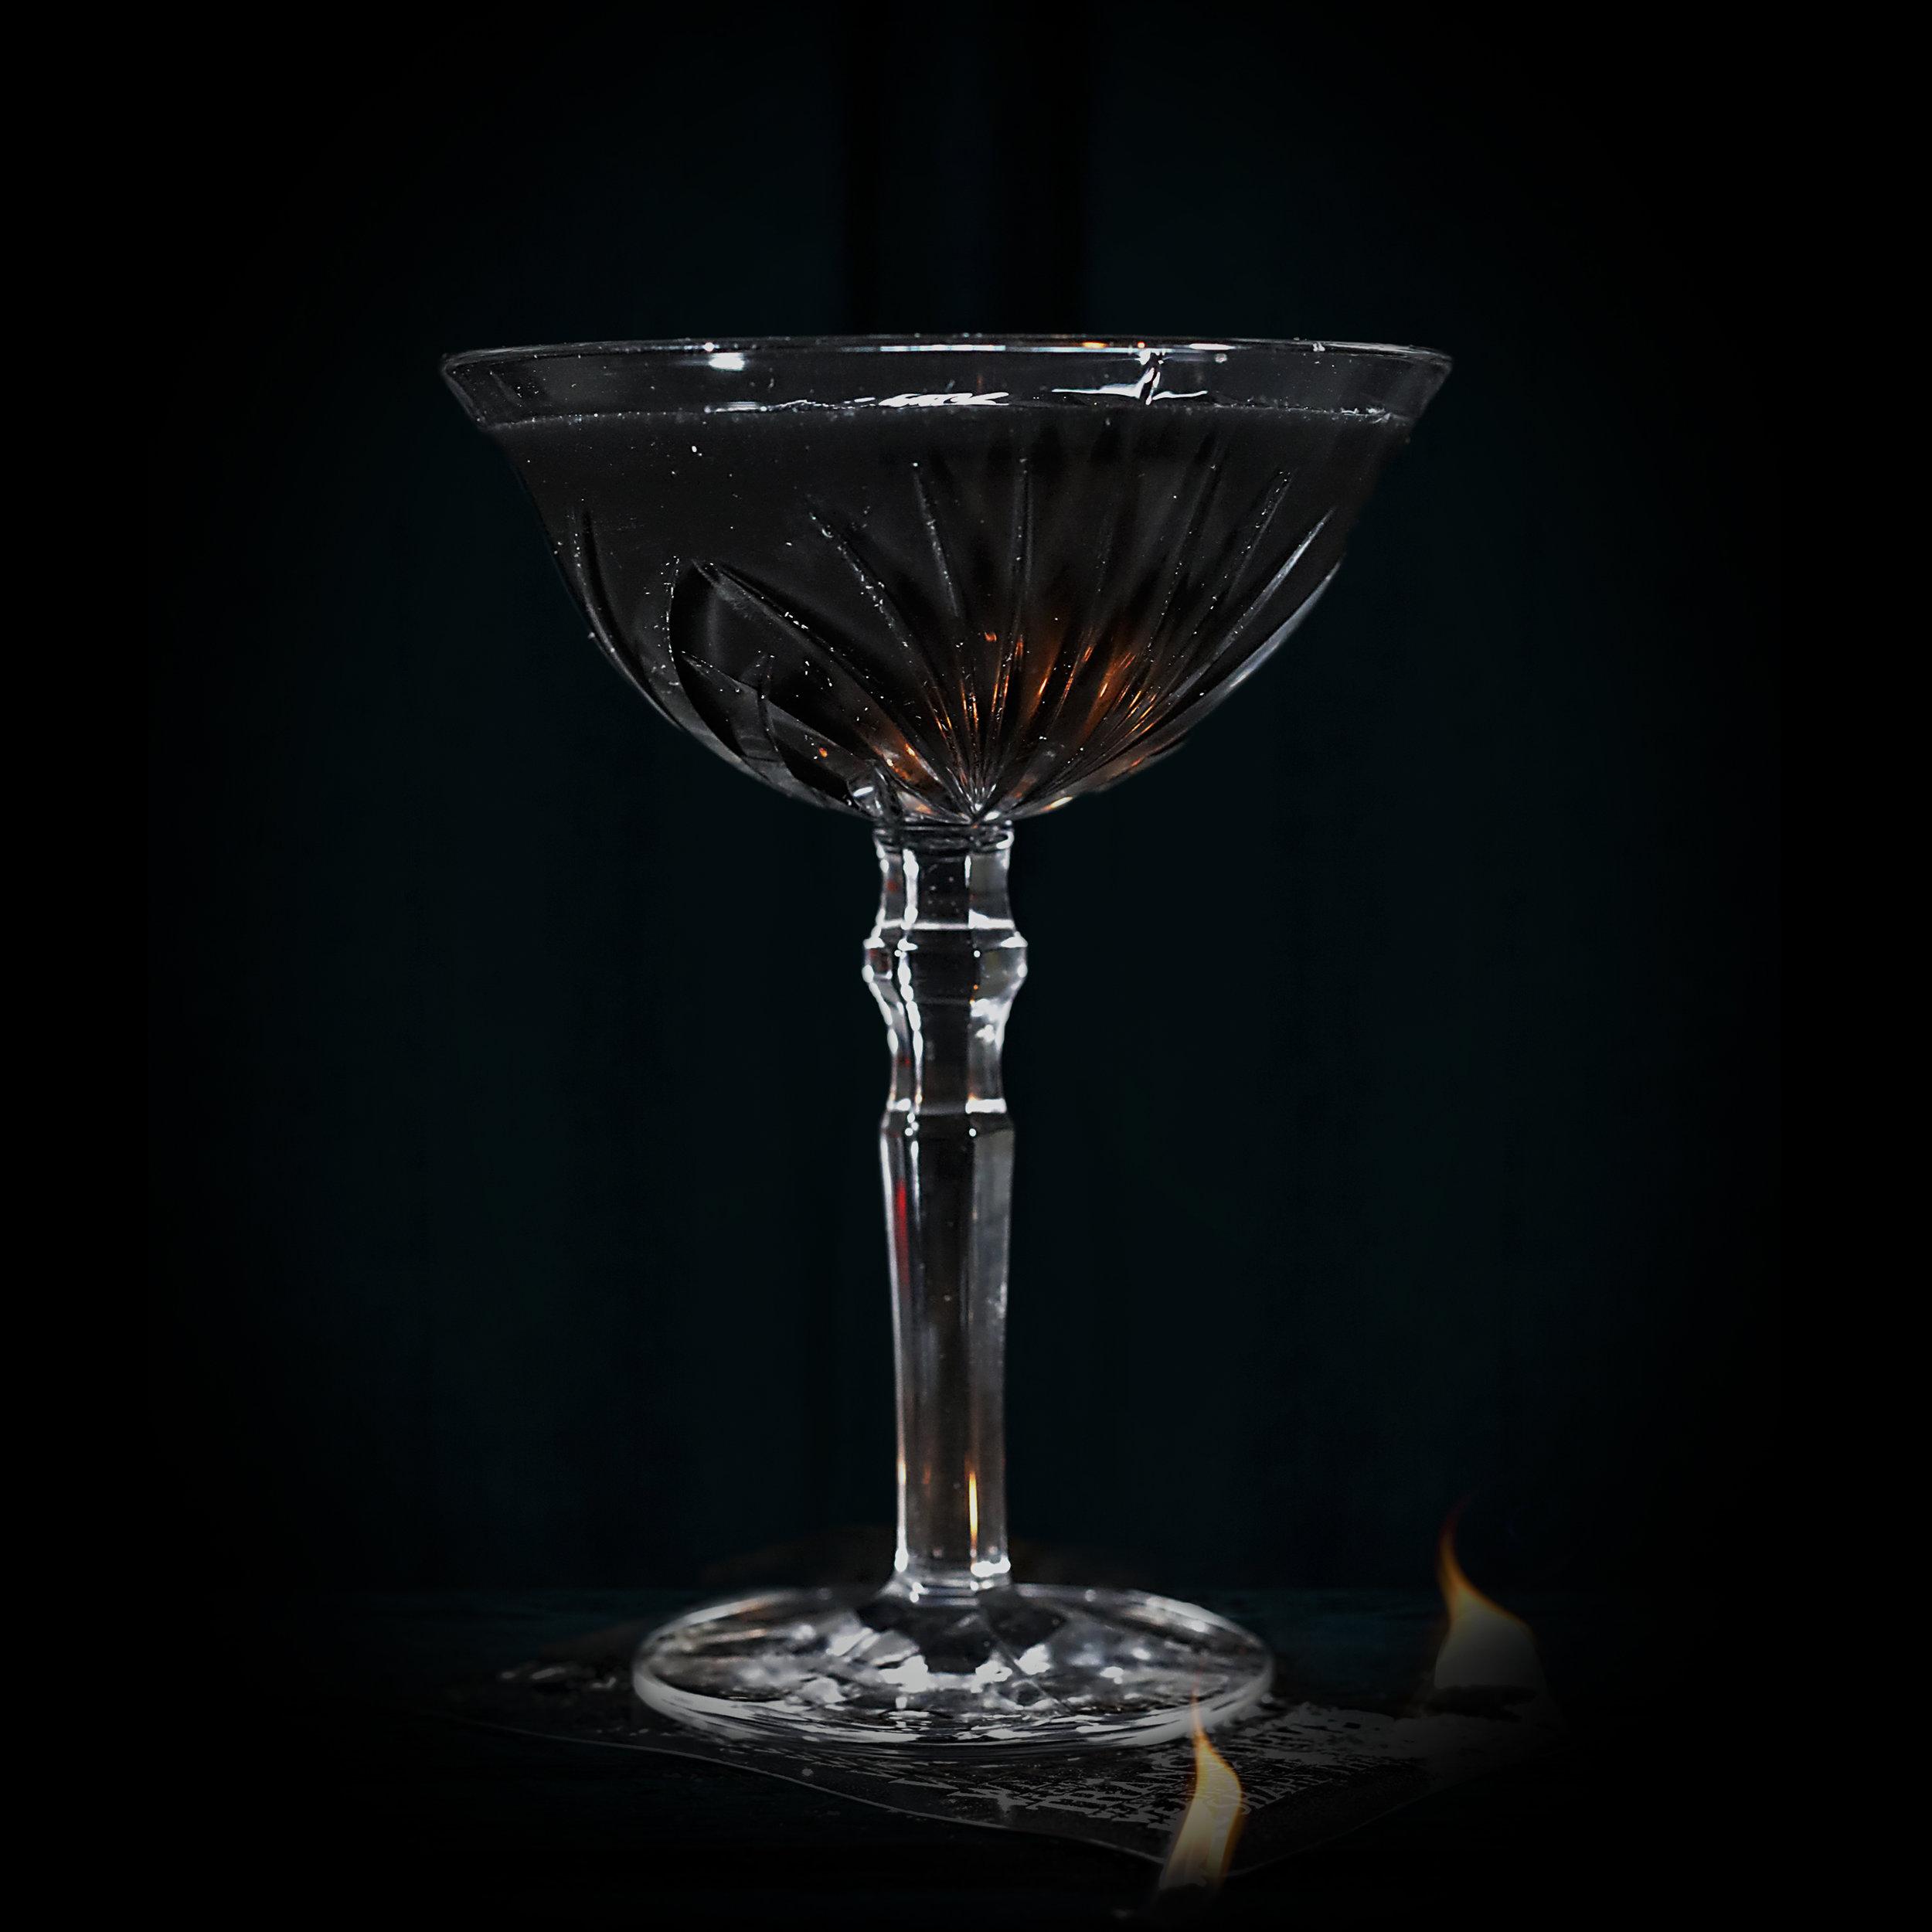 DAIQUIRI NOIR  INGREDIENTS  - 2 oz. Jalapeño infused El Silencio Espadin w/Activated Charcoal - .75 oz. Agave Nectar - 1 oz. Fresh Lime Juice  METHOD  Shake w/Ice and strain Cocktail Glass